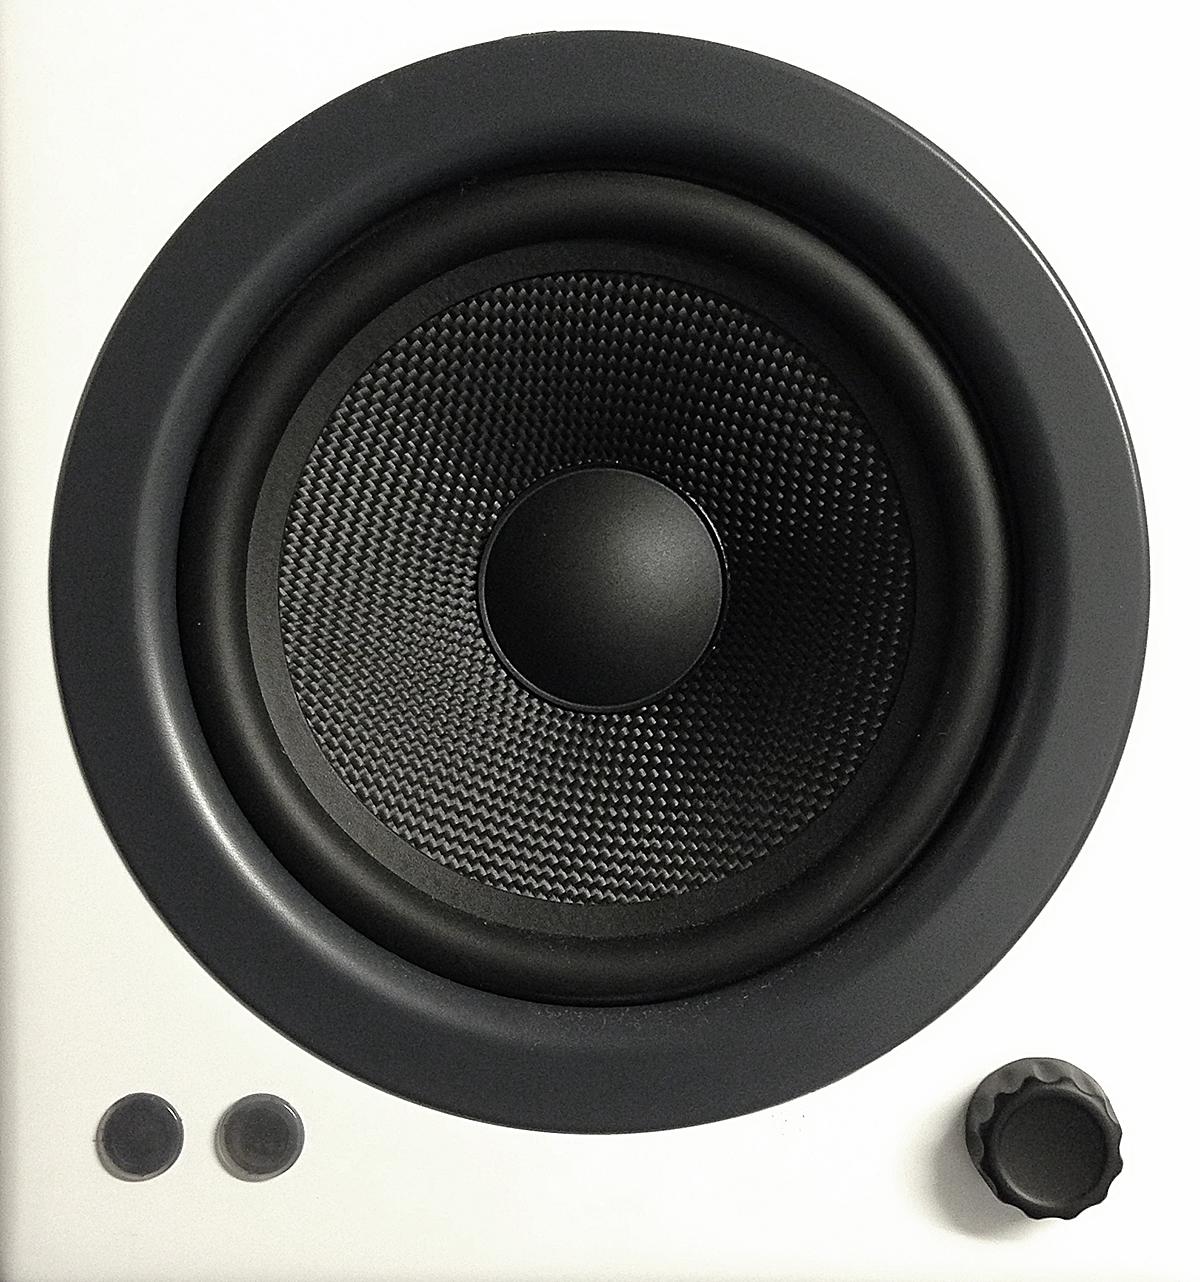 1200x1282 > Speakers Wallpapers